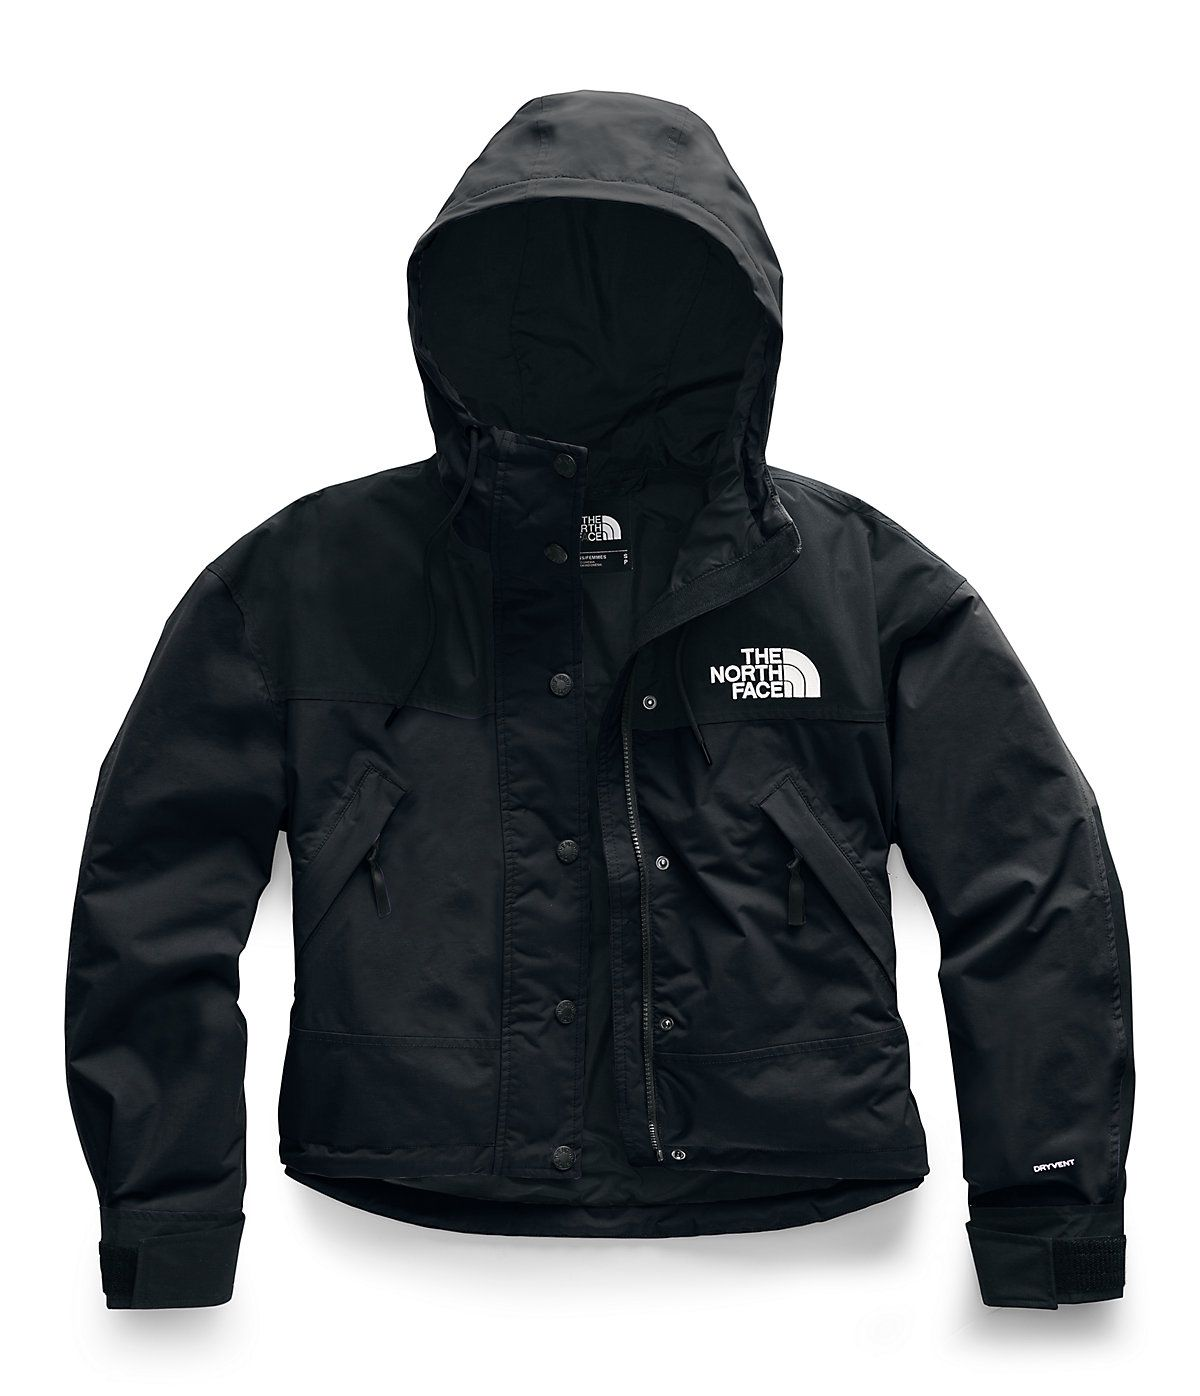 Women S Reigh On Jacket Free Shipping The North Face North Face Jacket Jackets Waterproof Jacket Women [ 1396 x 1200 Pixel ]